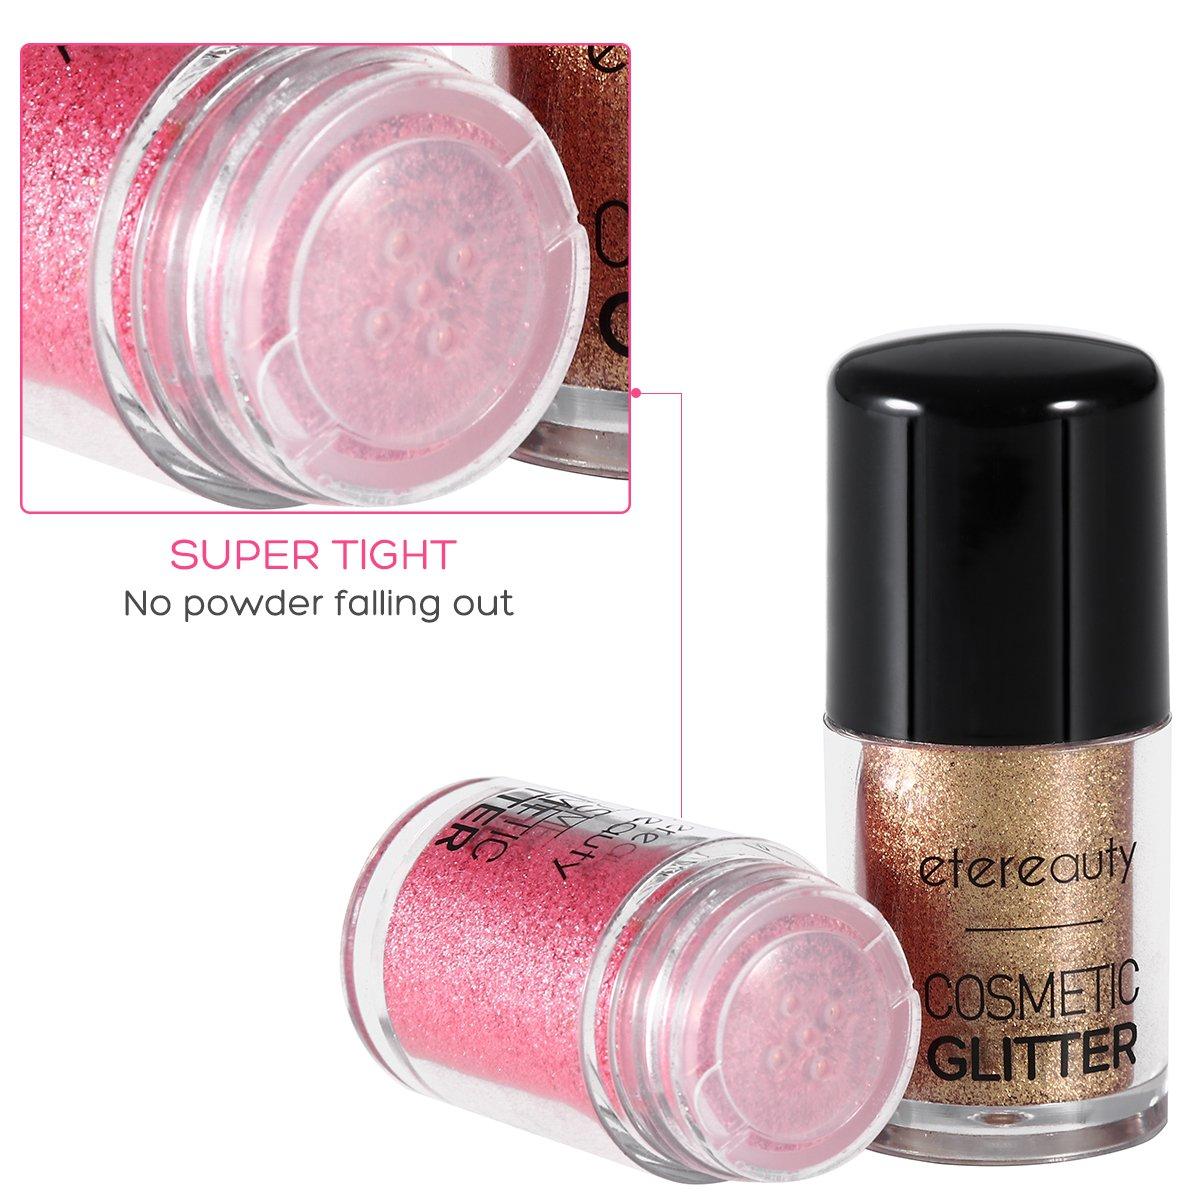 Cosmetics Eye shadow powder 4 Colors Makeup Pro Glitter Eyeshadow